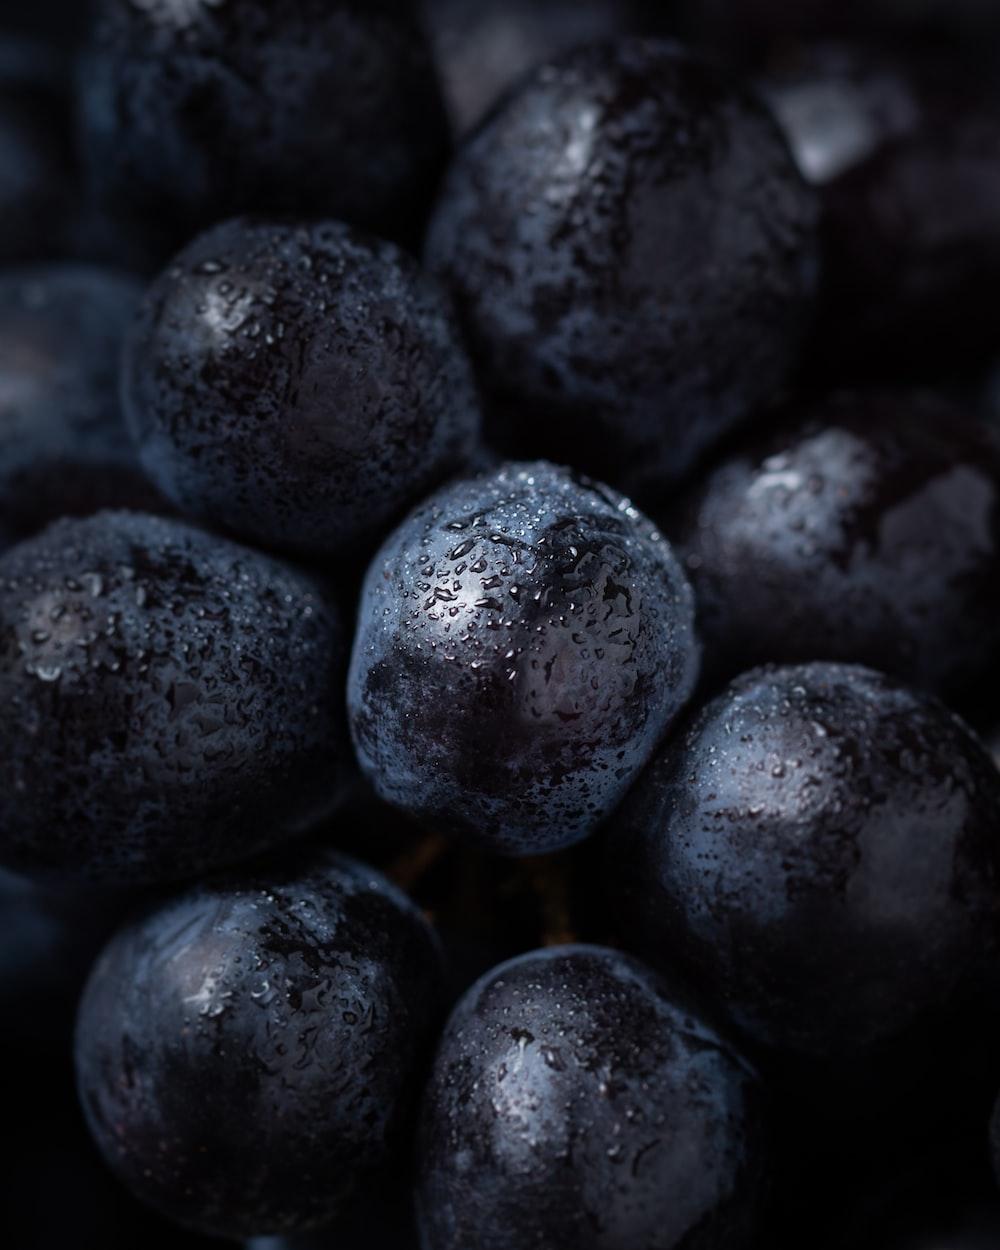 wet blueberries